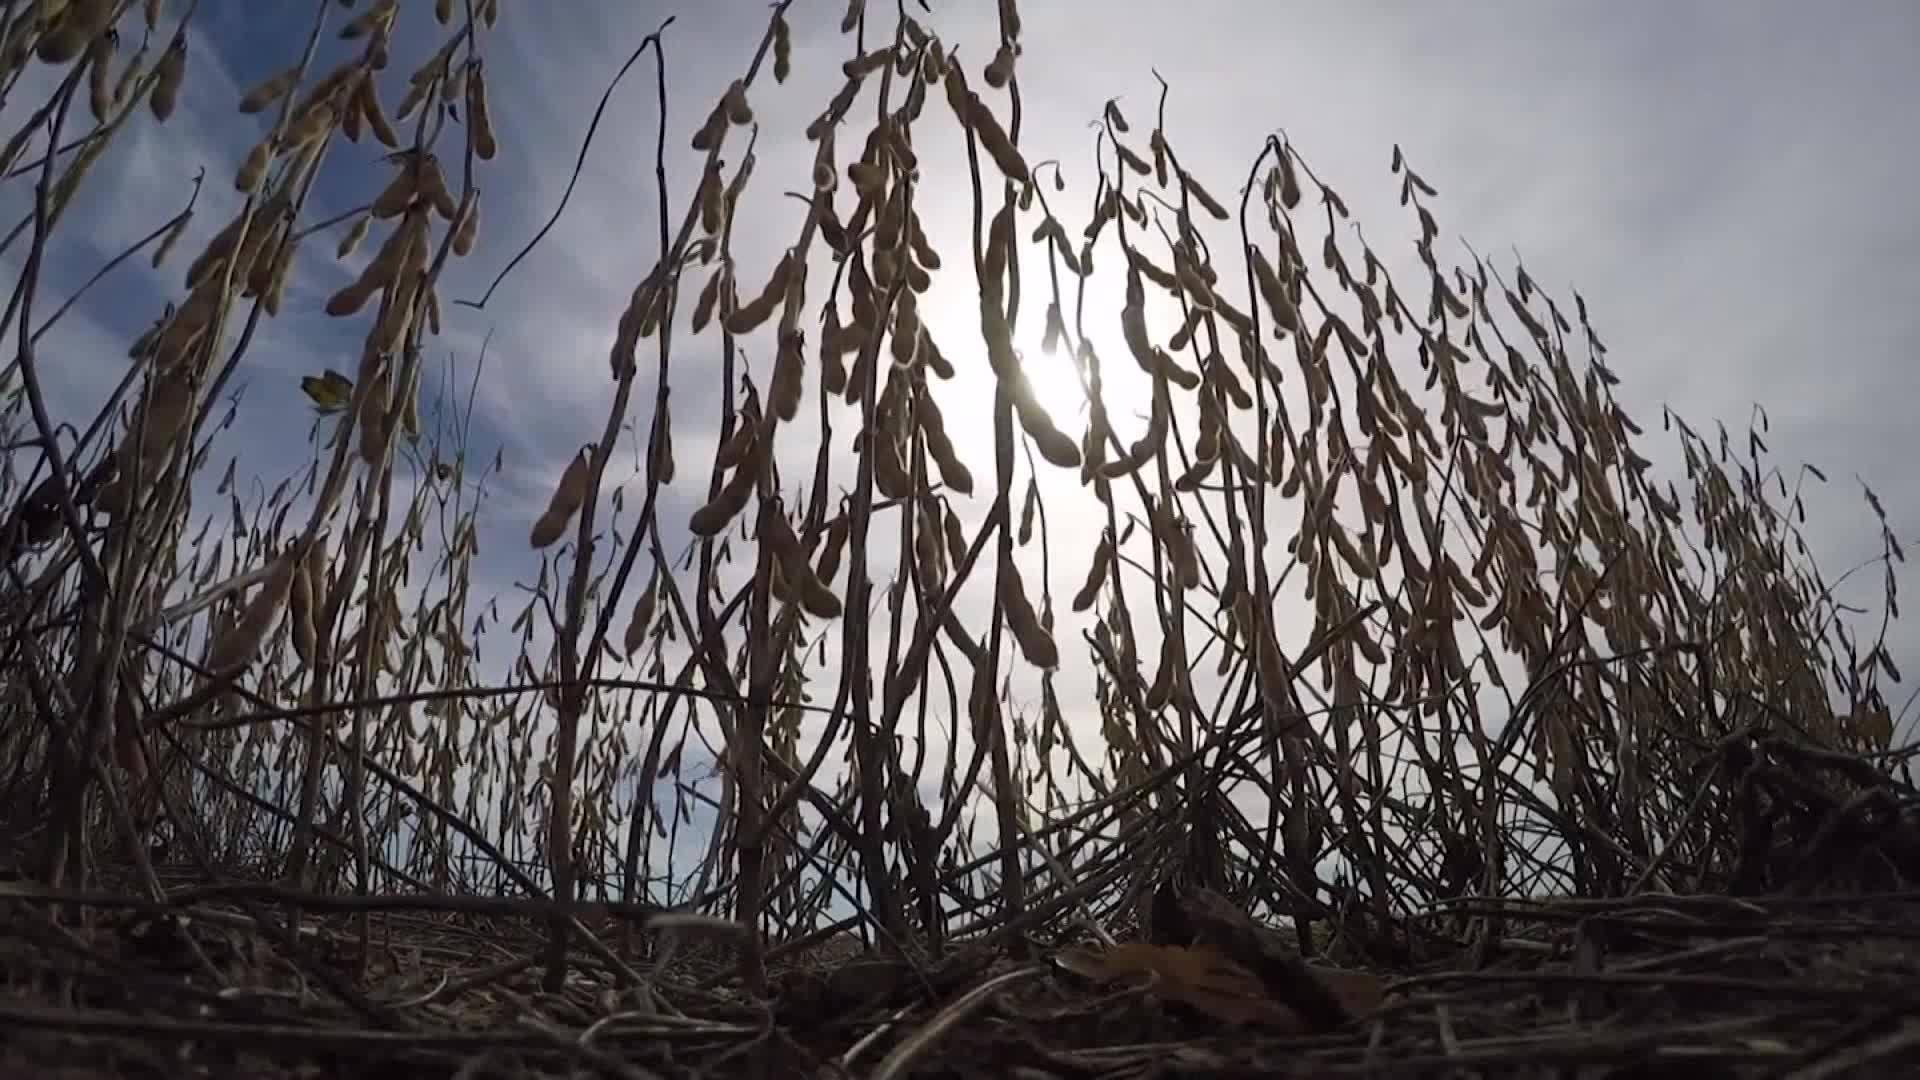 Rain impacts south Louisiana soybean farmers